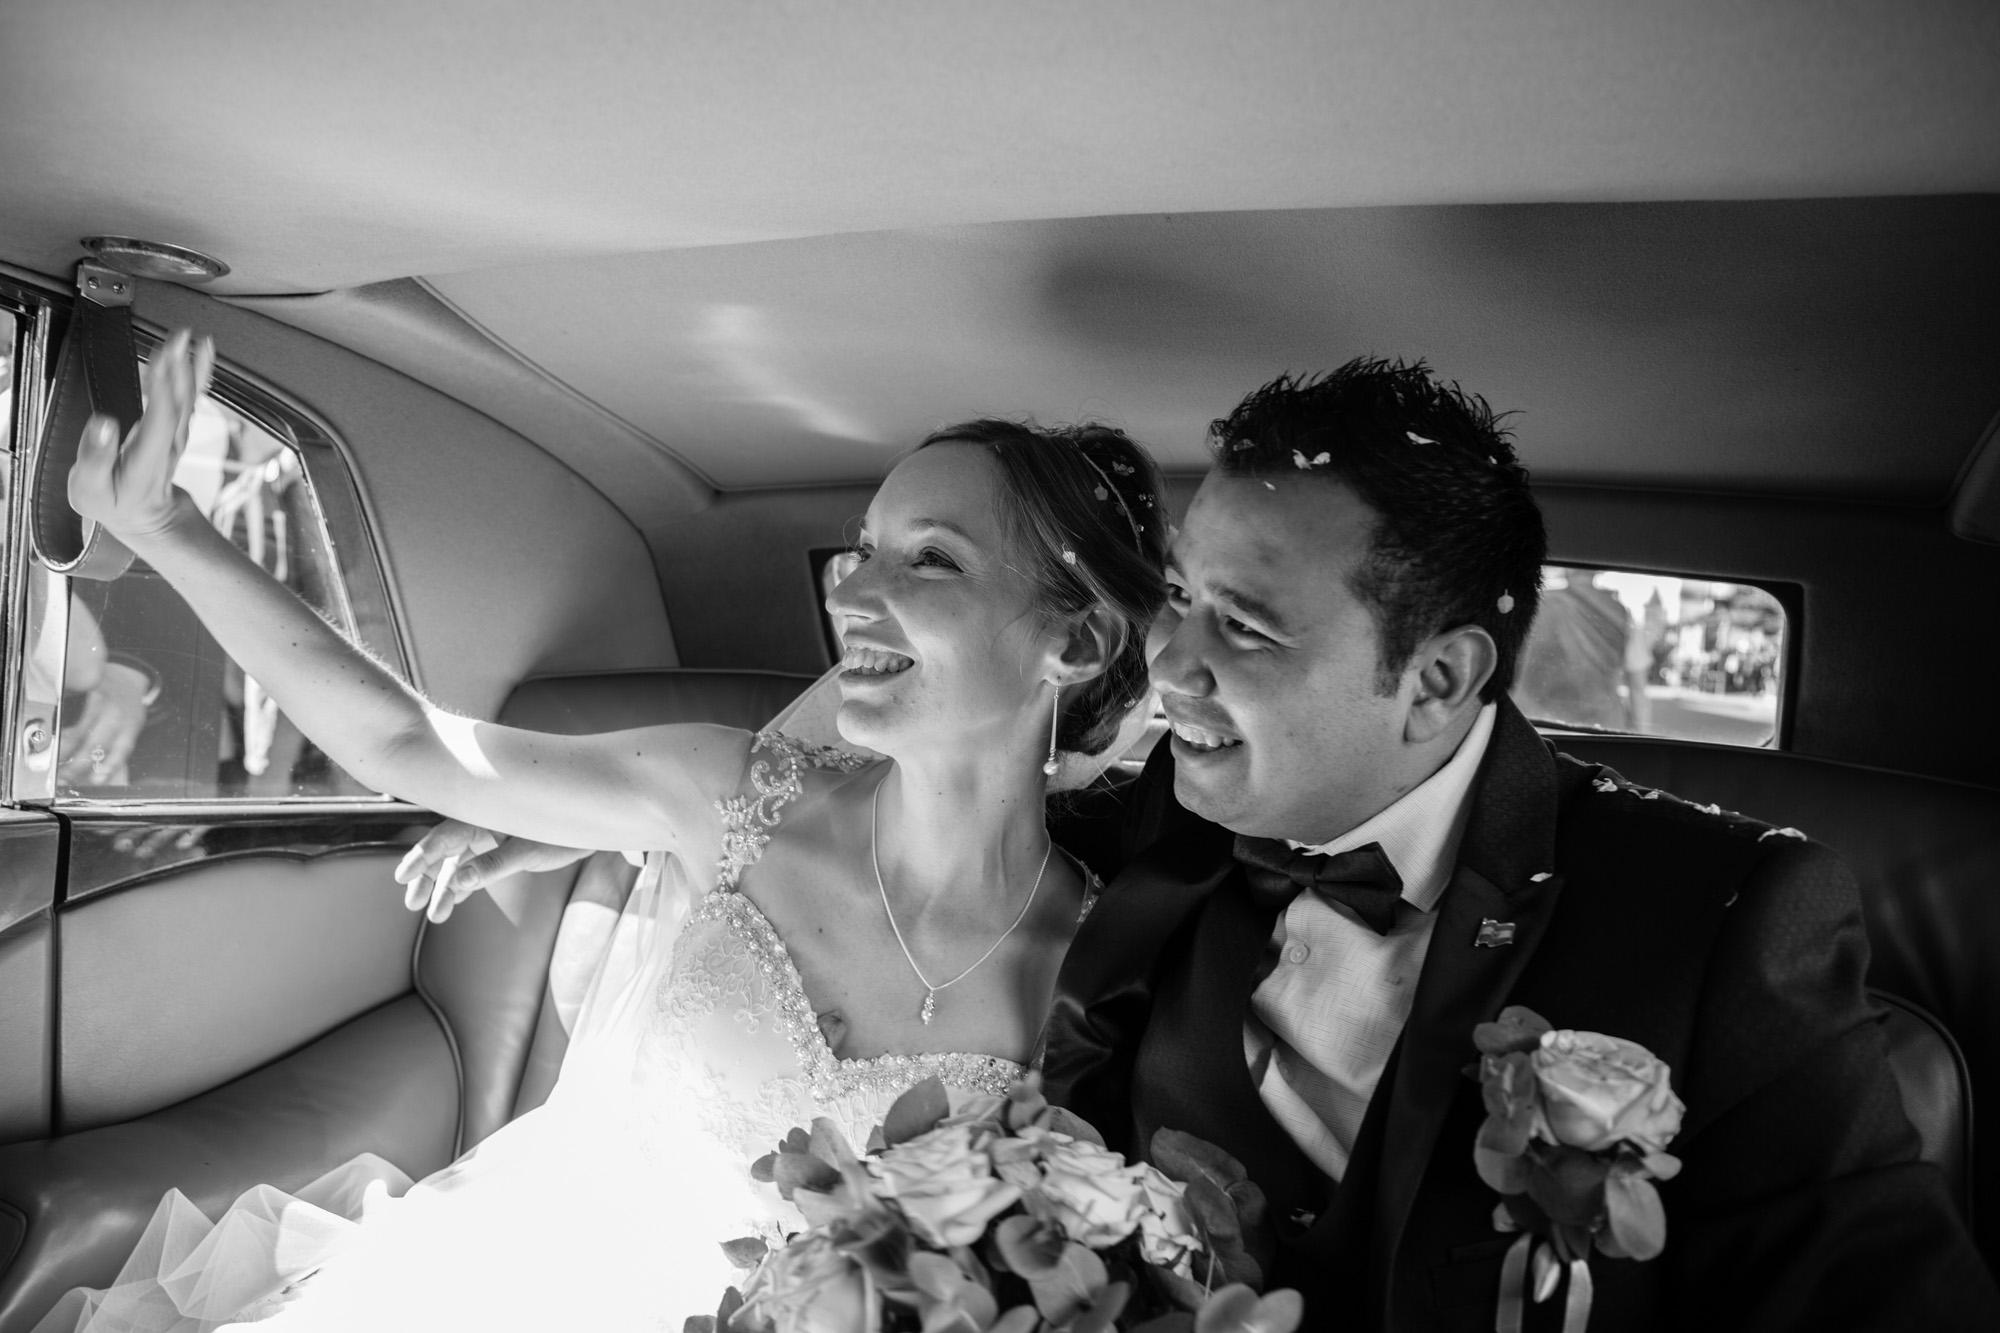 weddings-couples-love-photographer-oxford-london-jonathan-self-photography-50.jpg